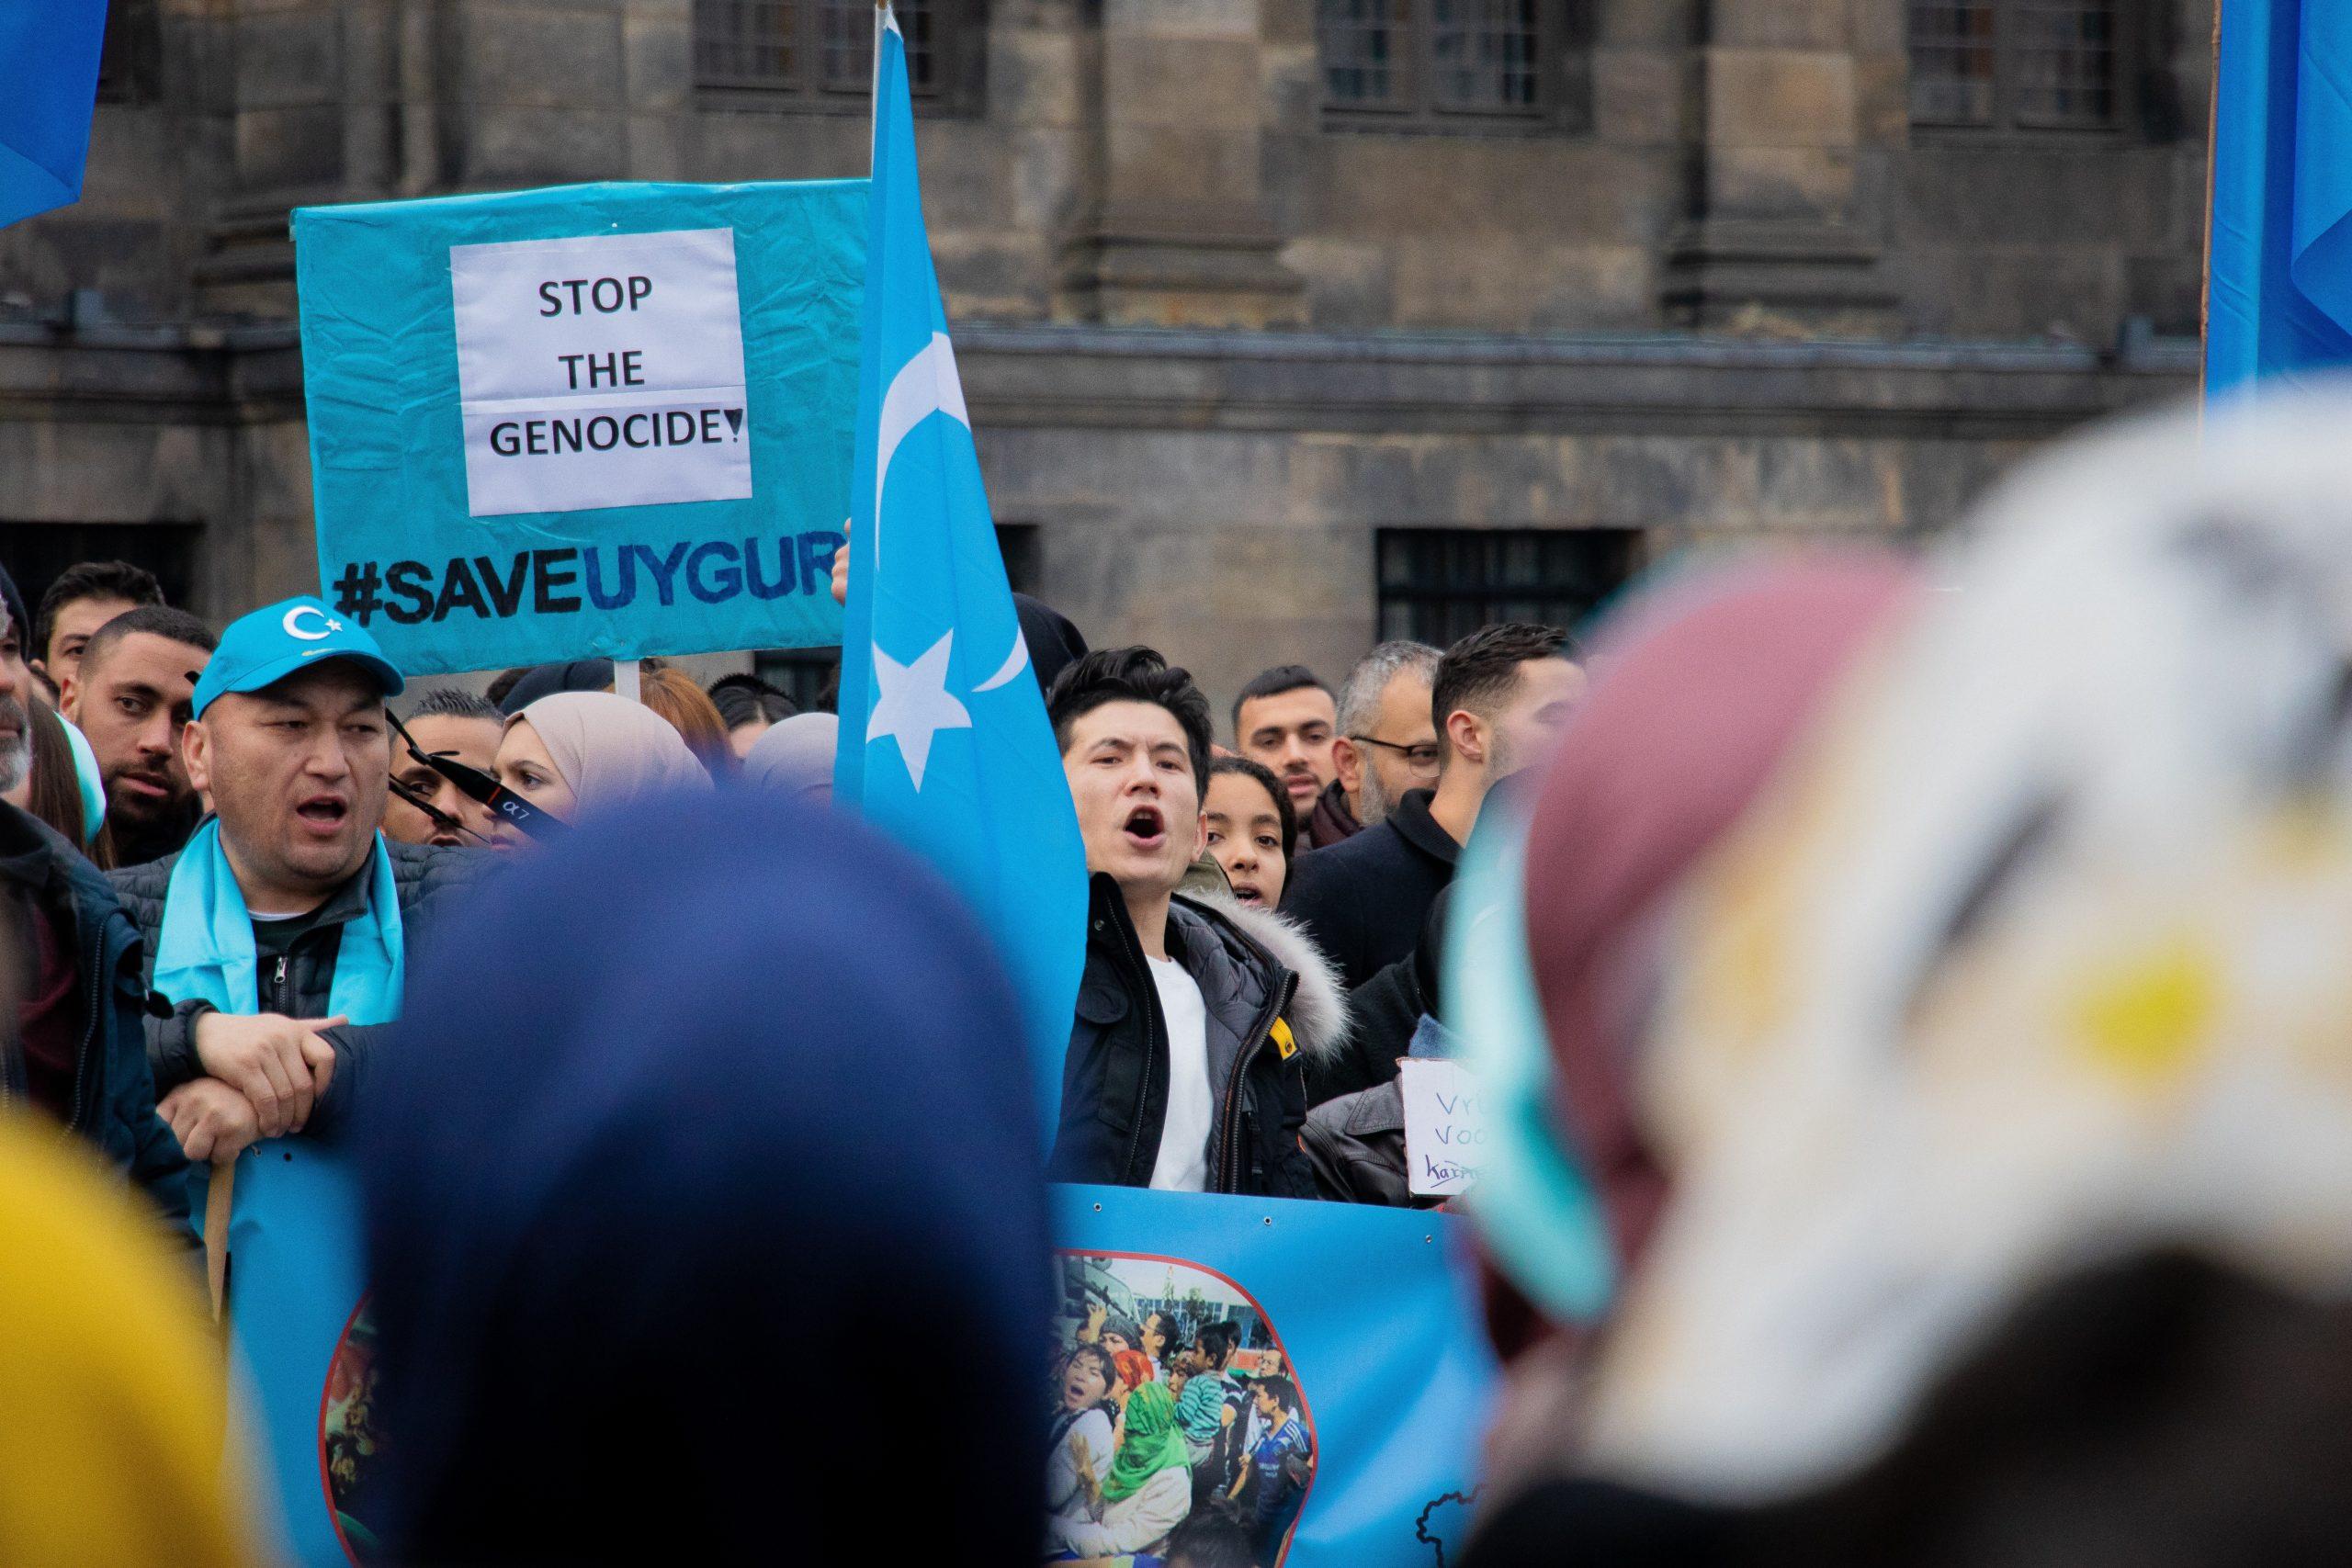 Academics are sick of leftists' denial of atrocities against Uyghurs in Xinjiang